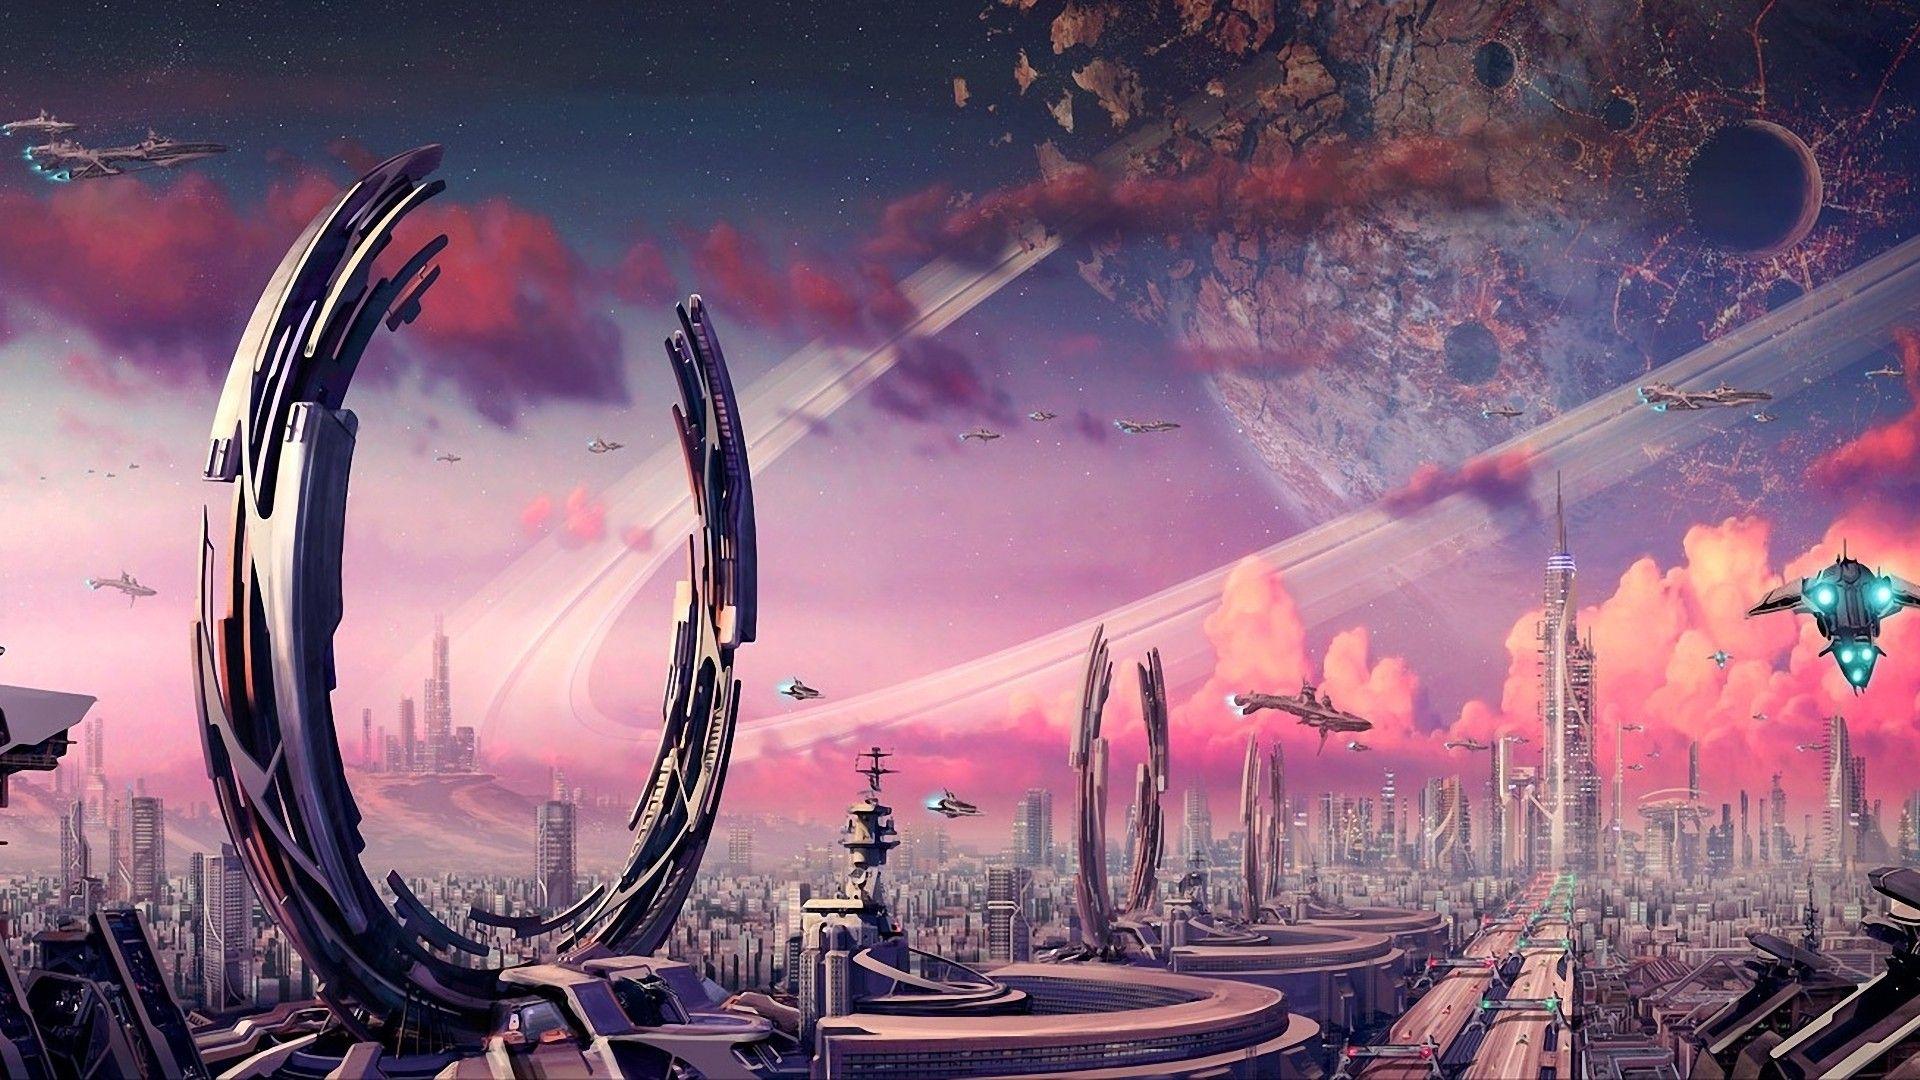 hd wallpaper starship space city purple wallpapershd